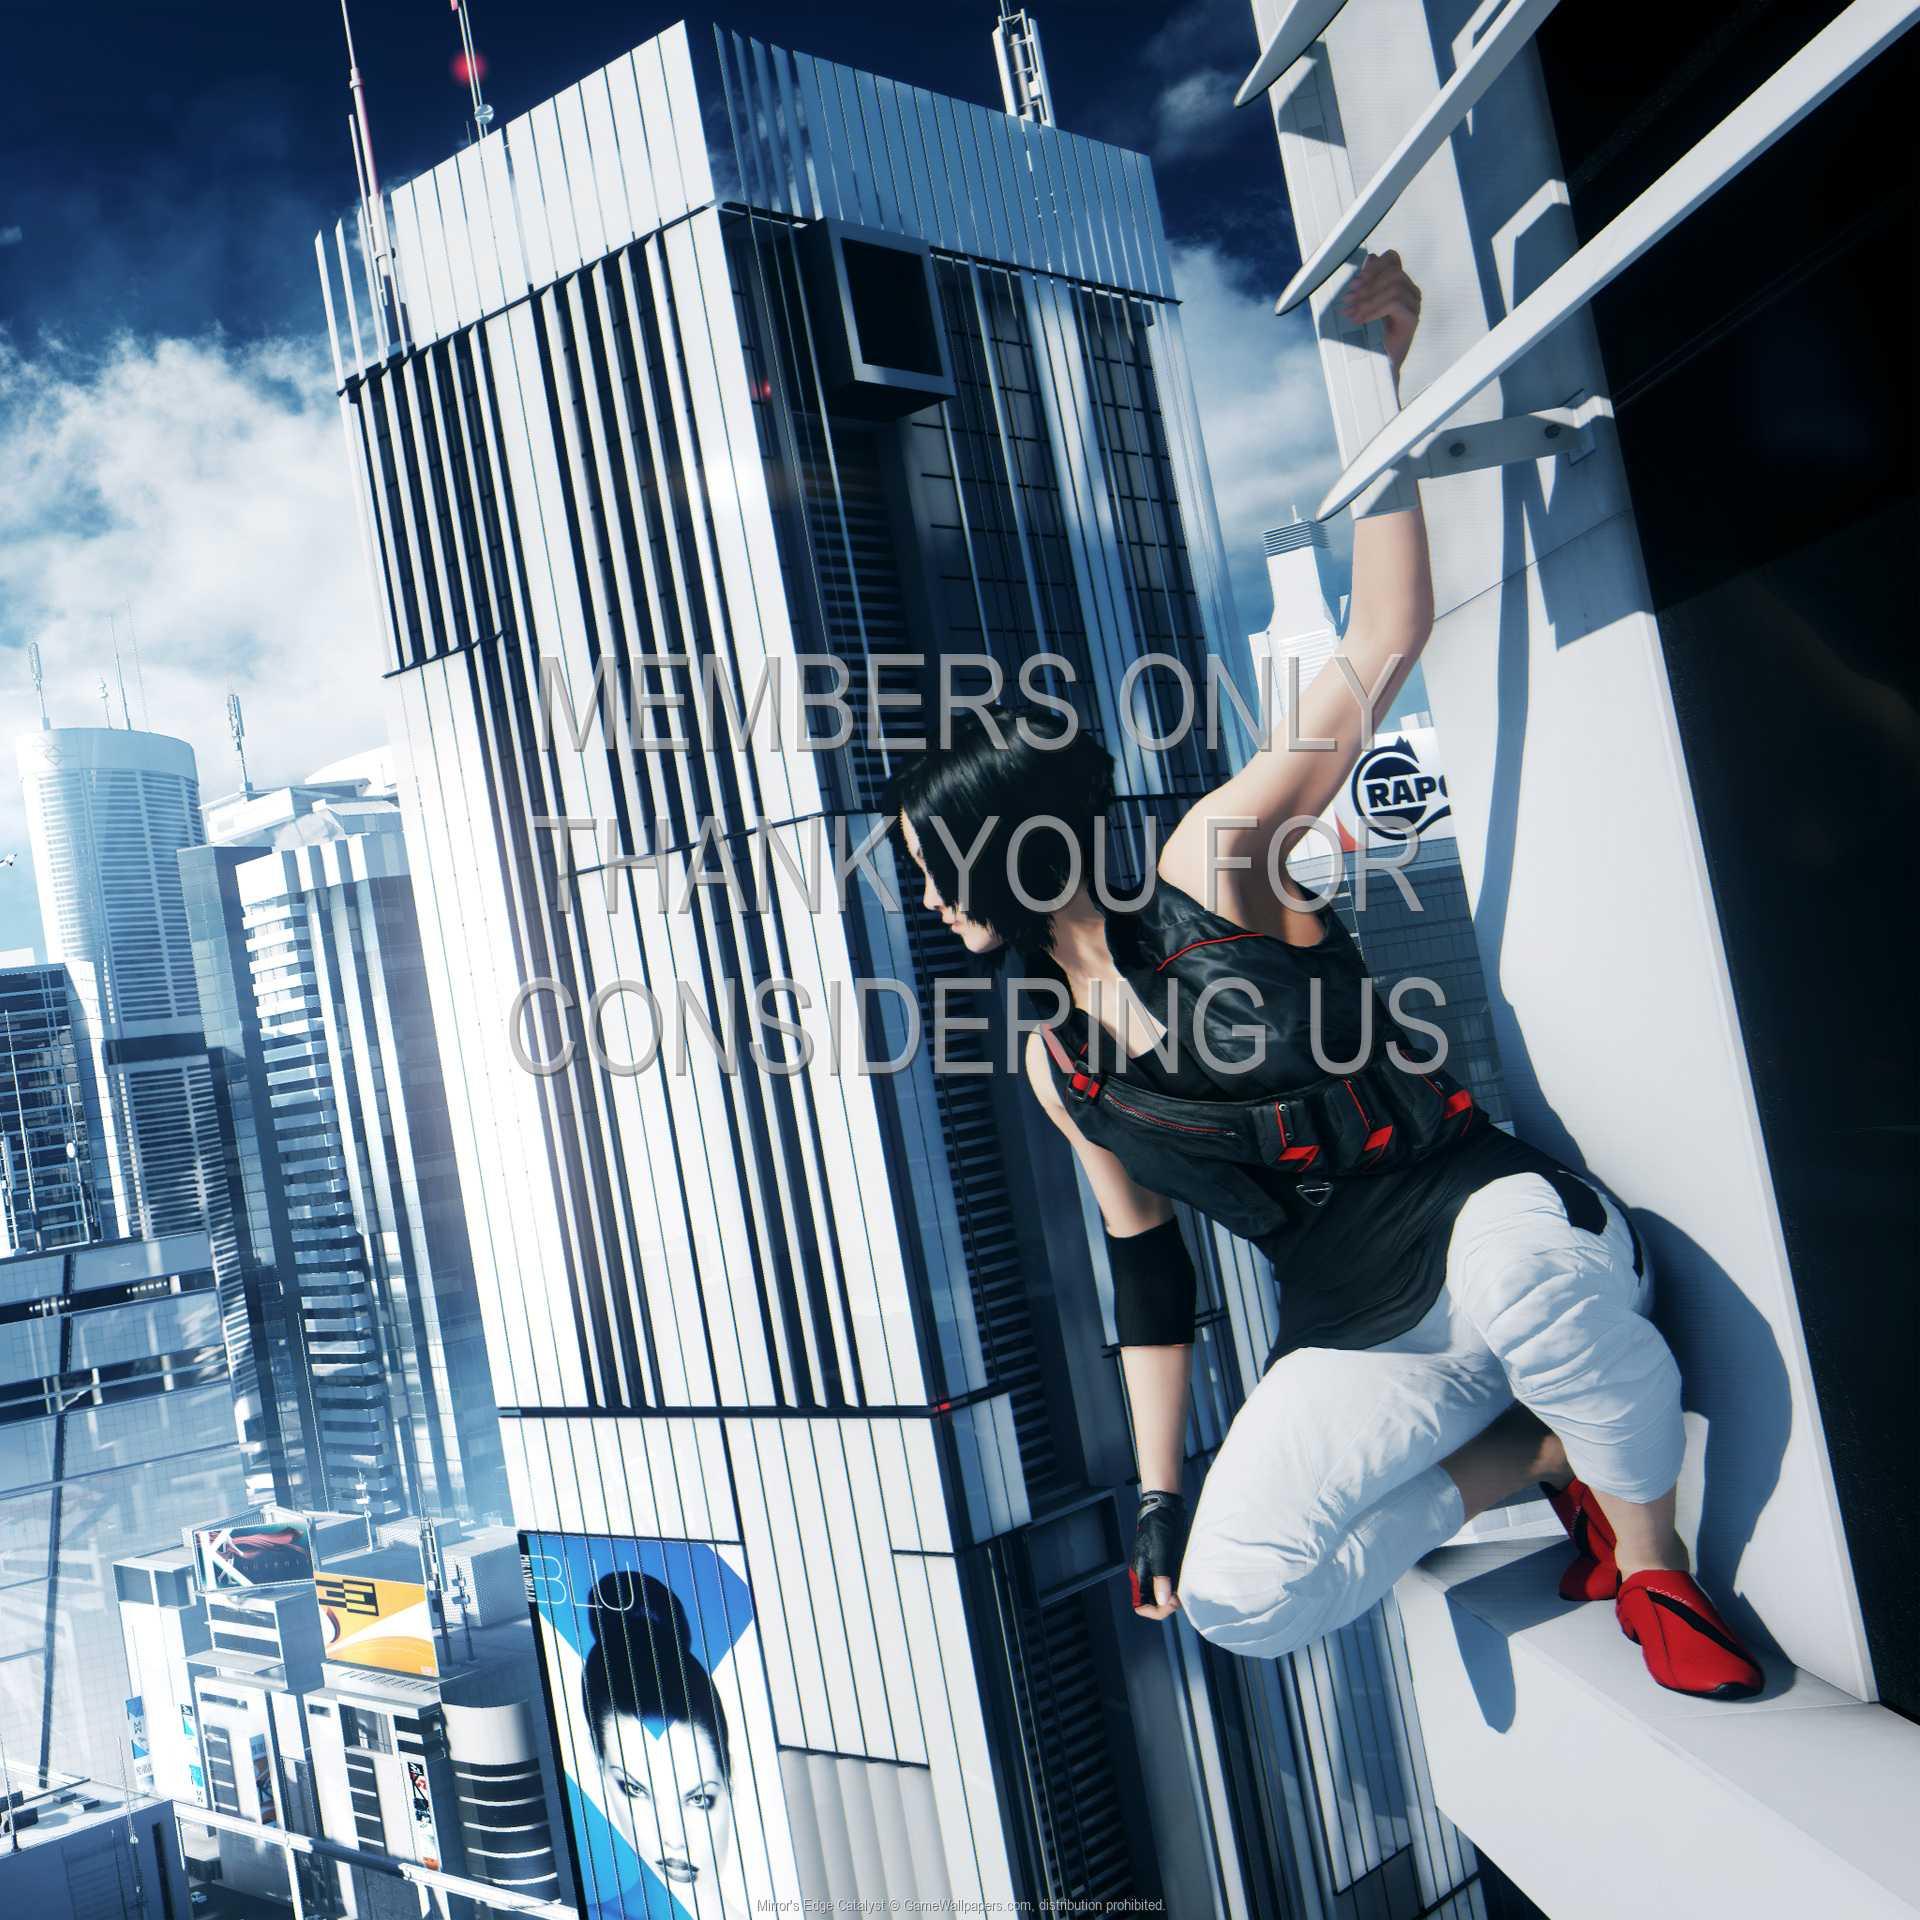 Mirror's Edge: Catalyst 1080p Horizontal Mobile wallpaper or background 01